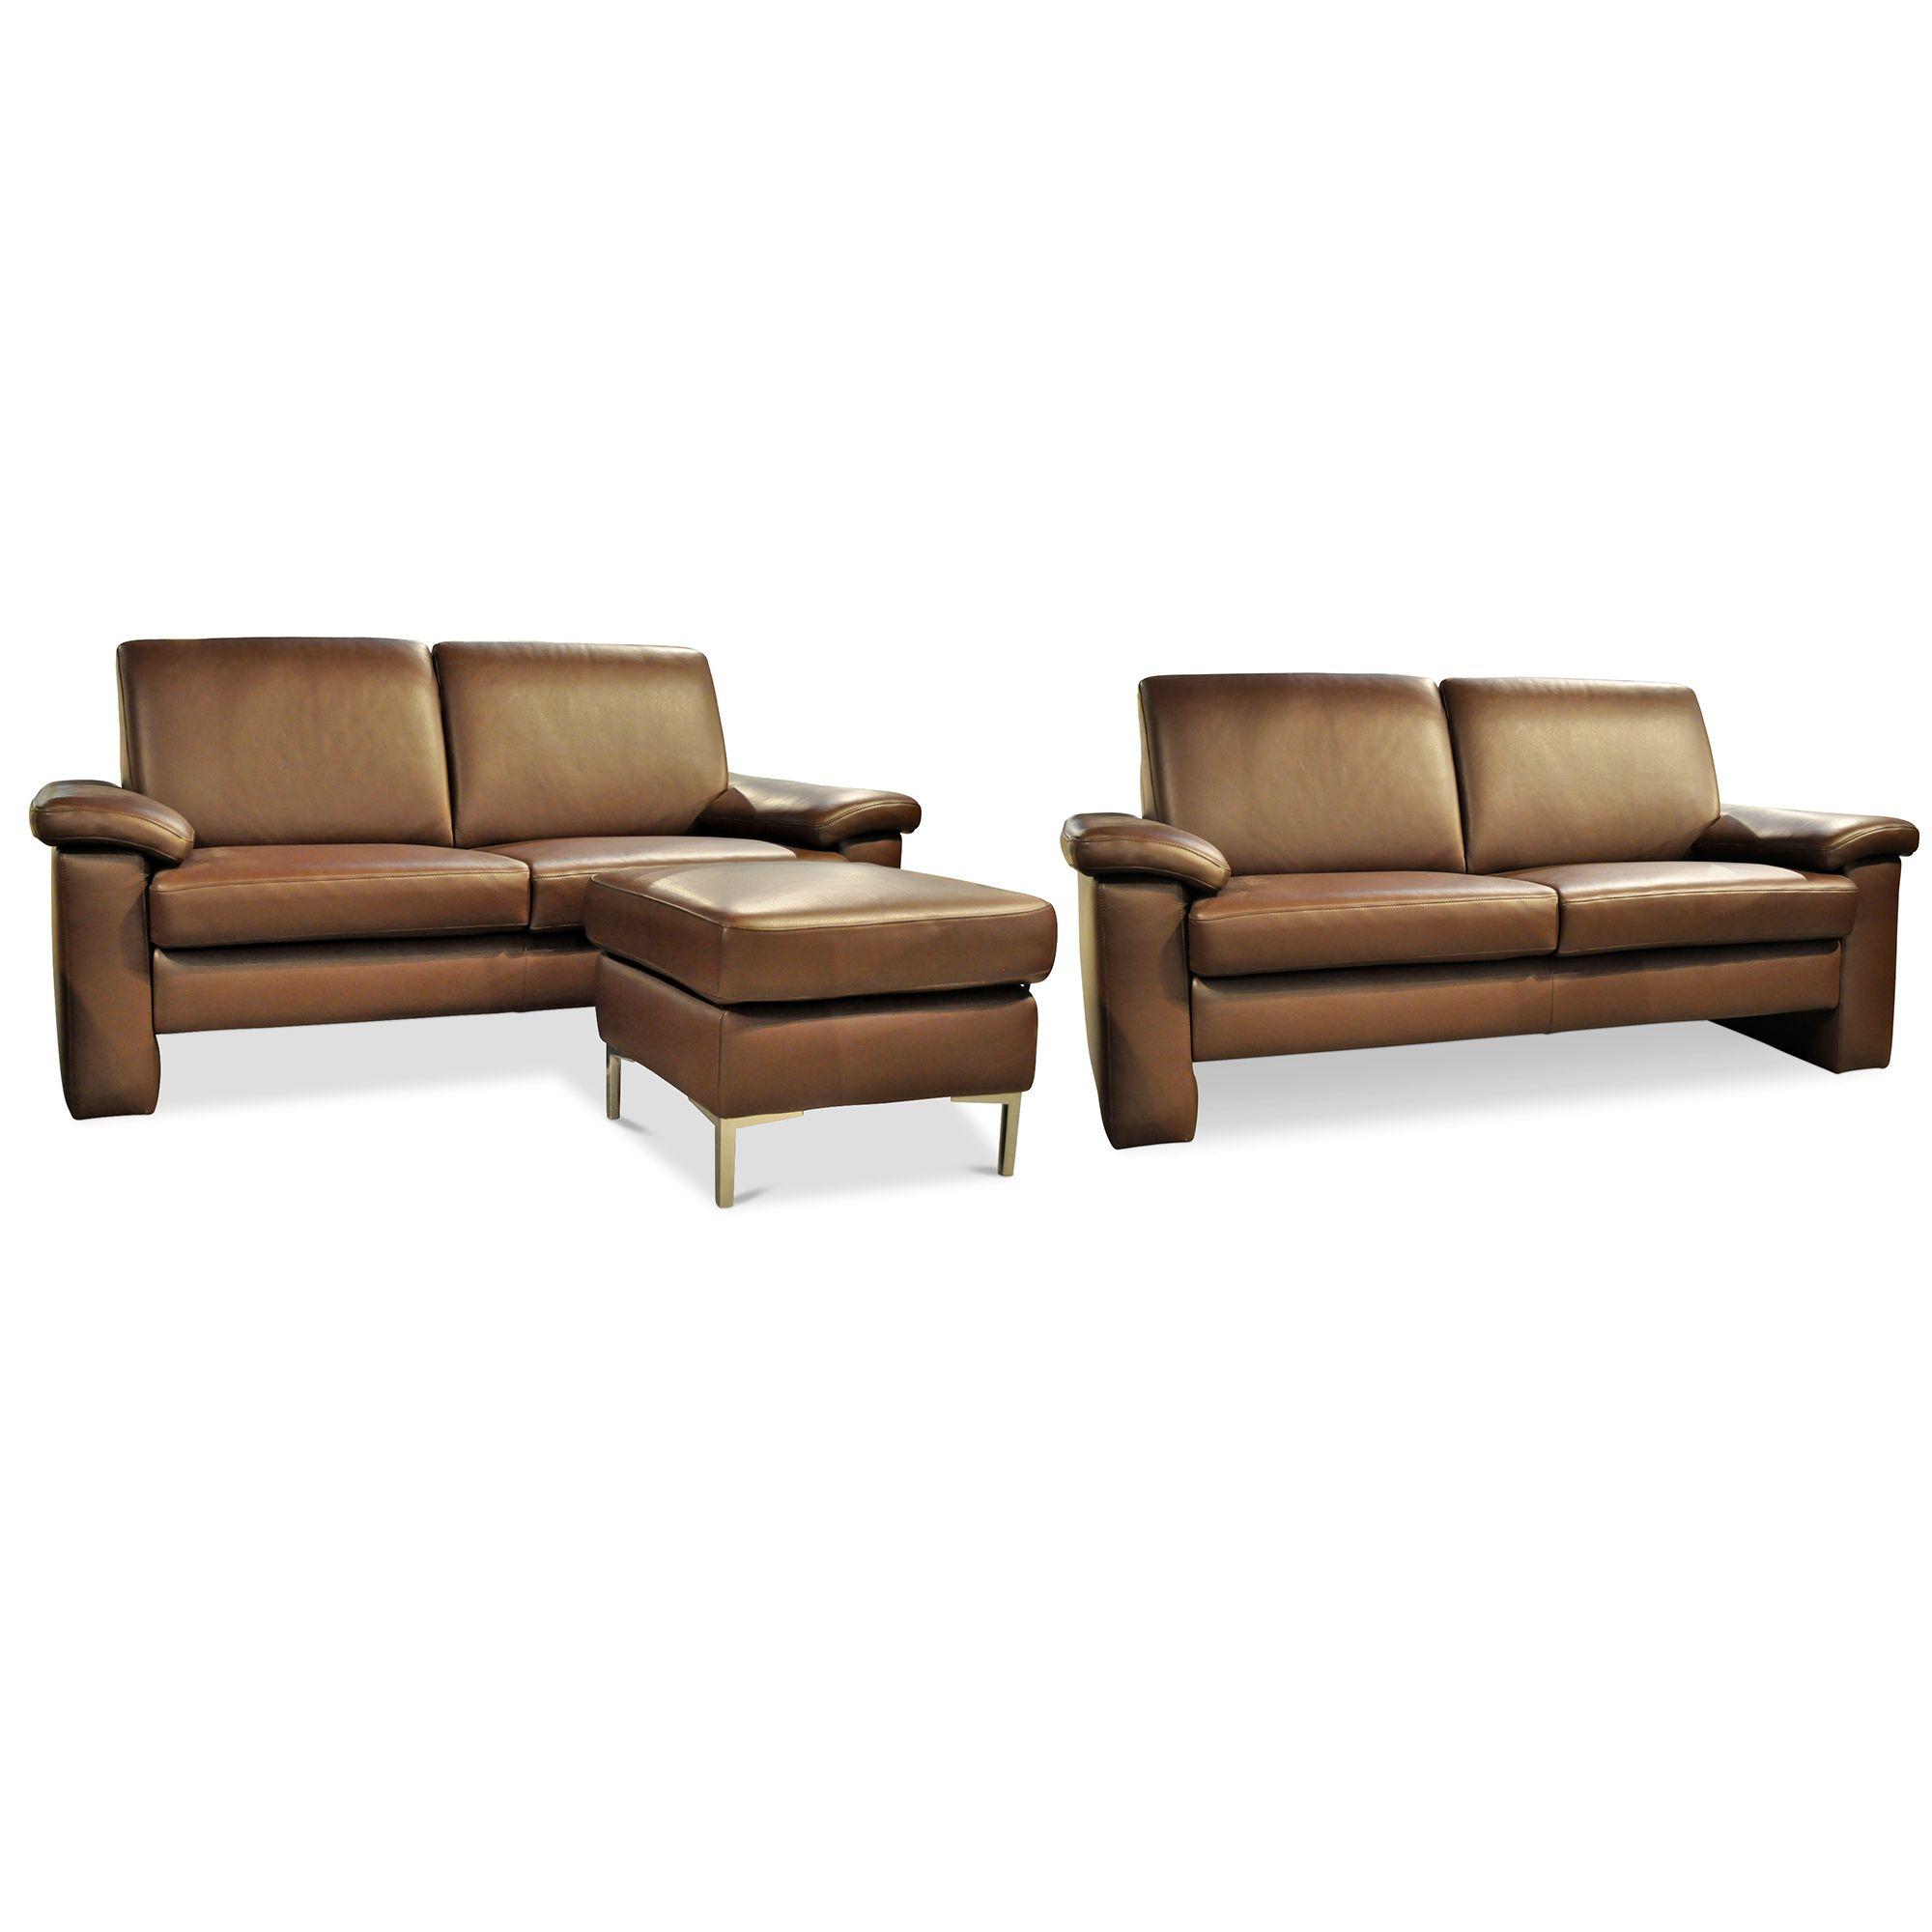 Garnitur MR 275 (3-Sitzer, 2-Sitzer, Hocker) – Musterring – Sofas ...